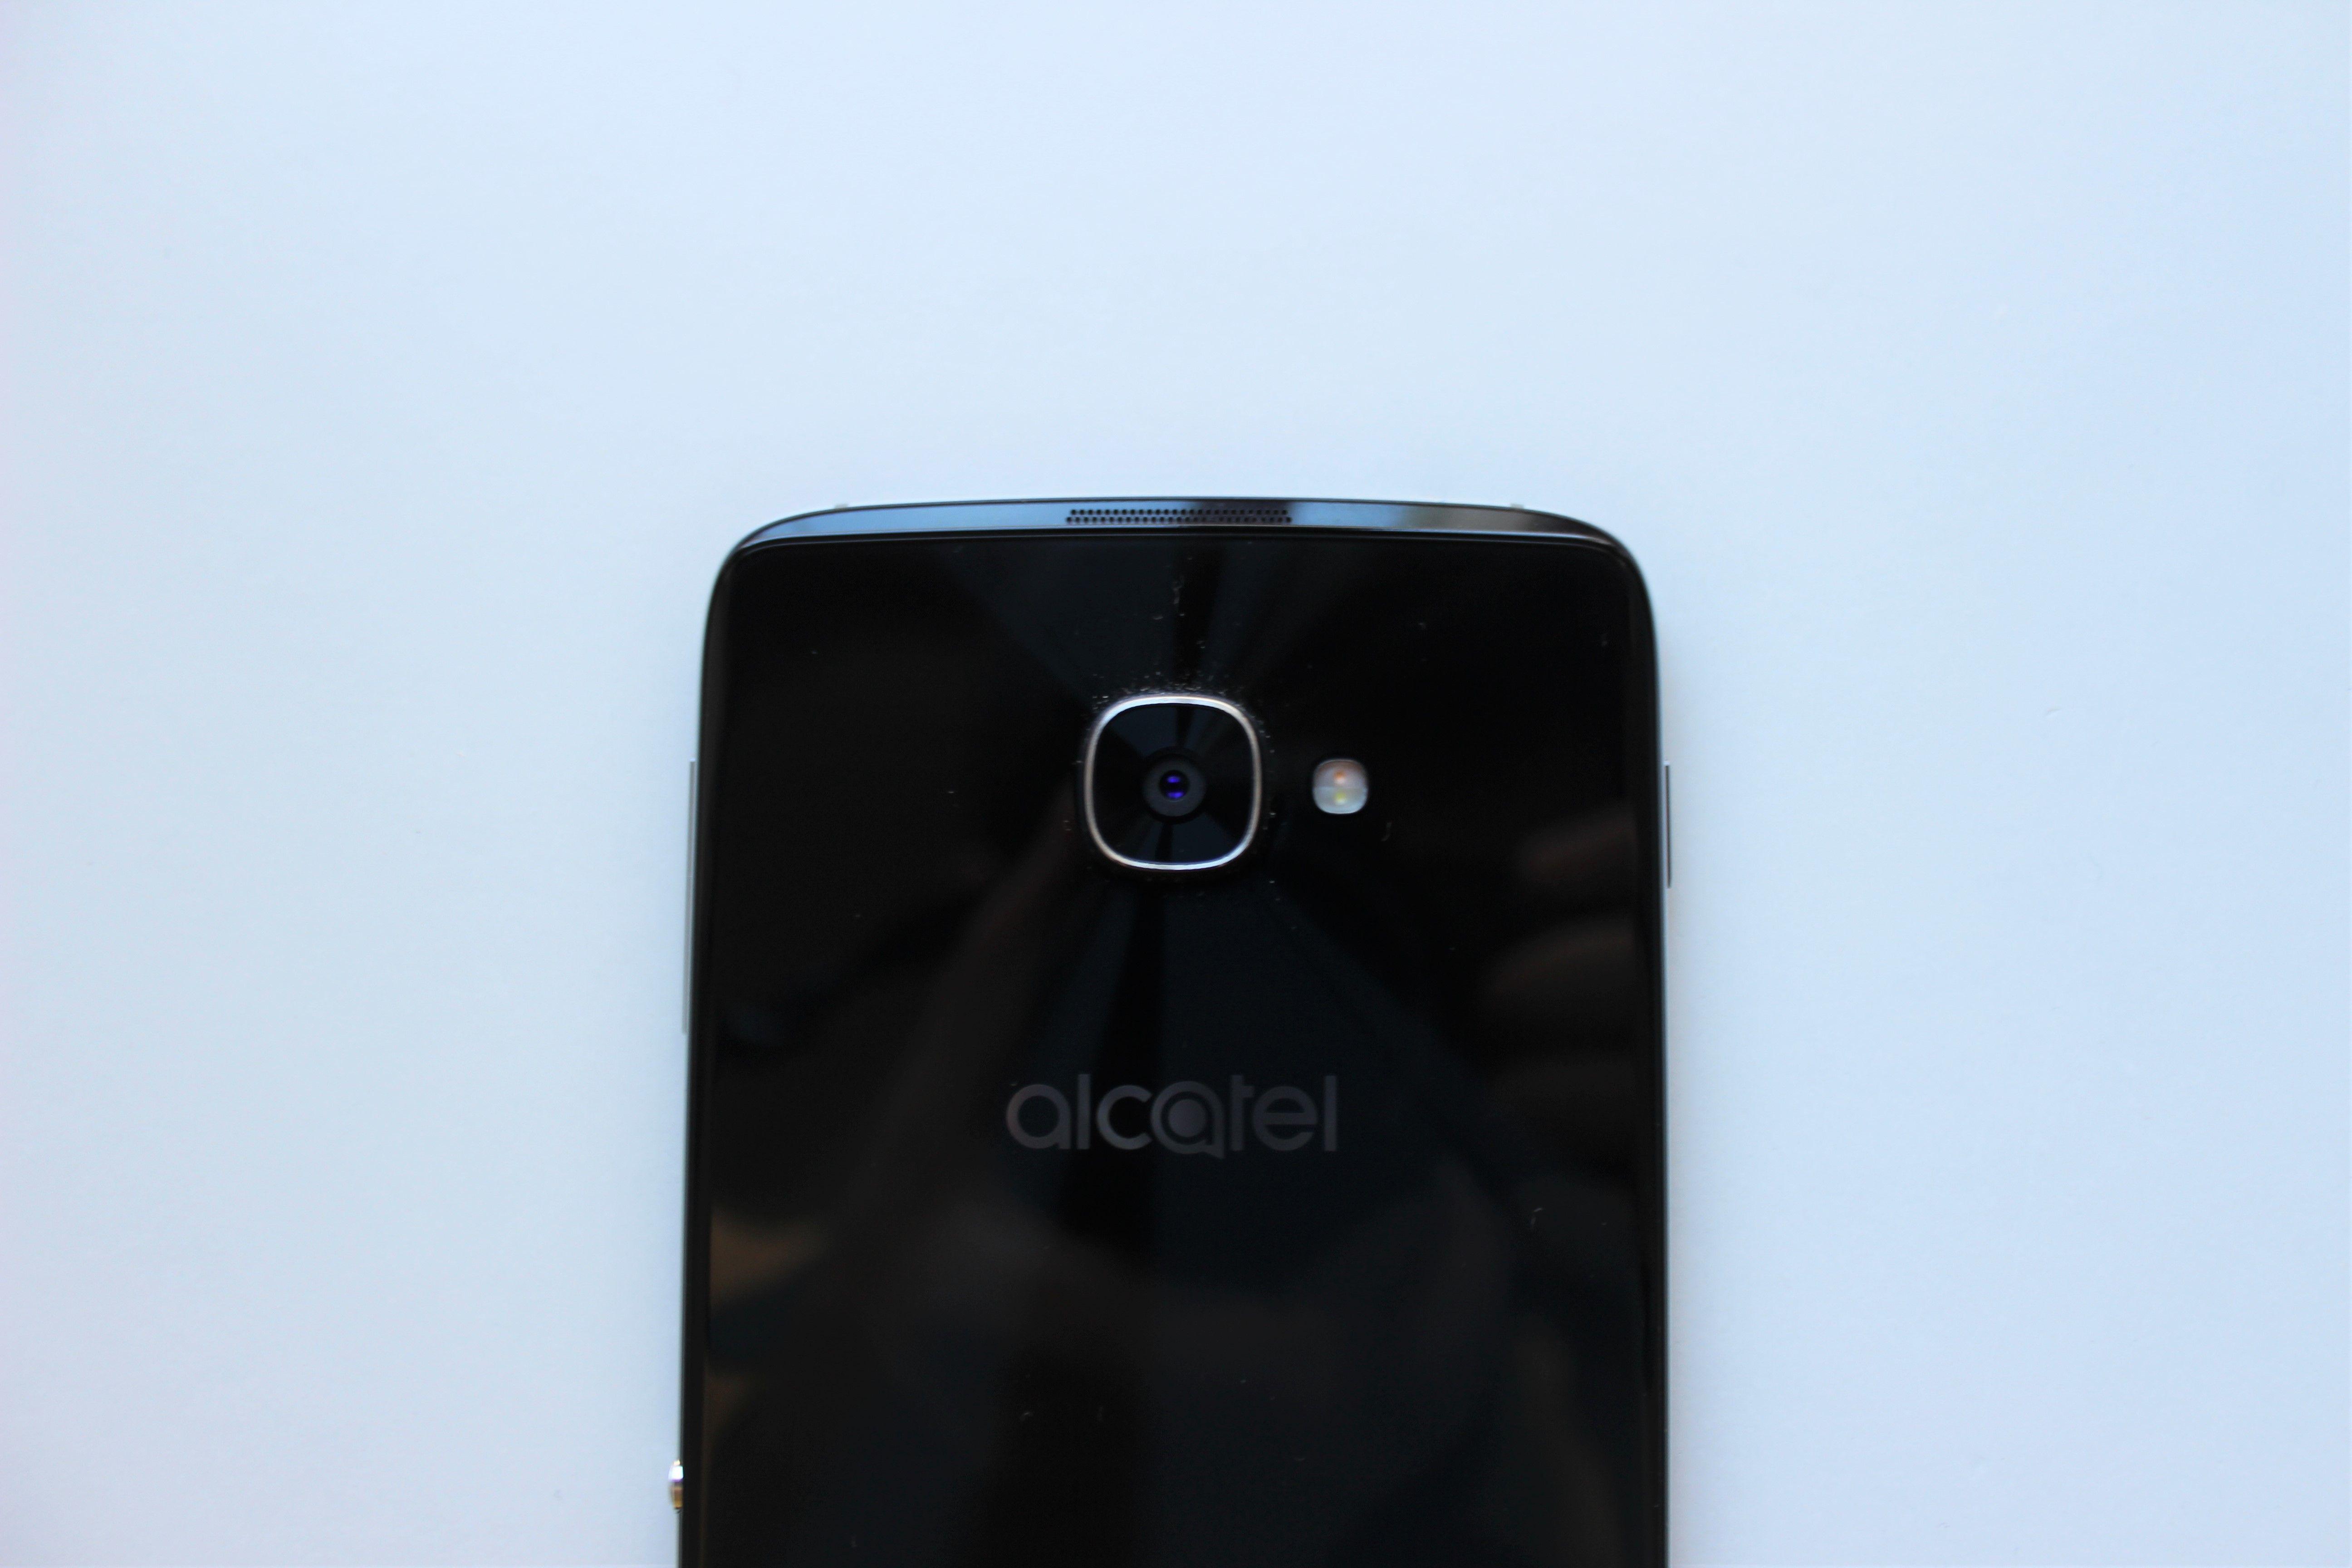 alcatel idol 4 review analise 3